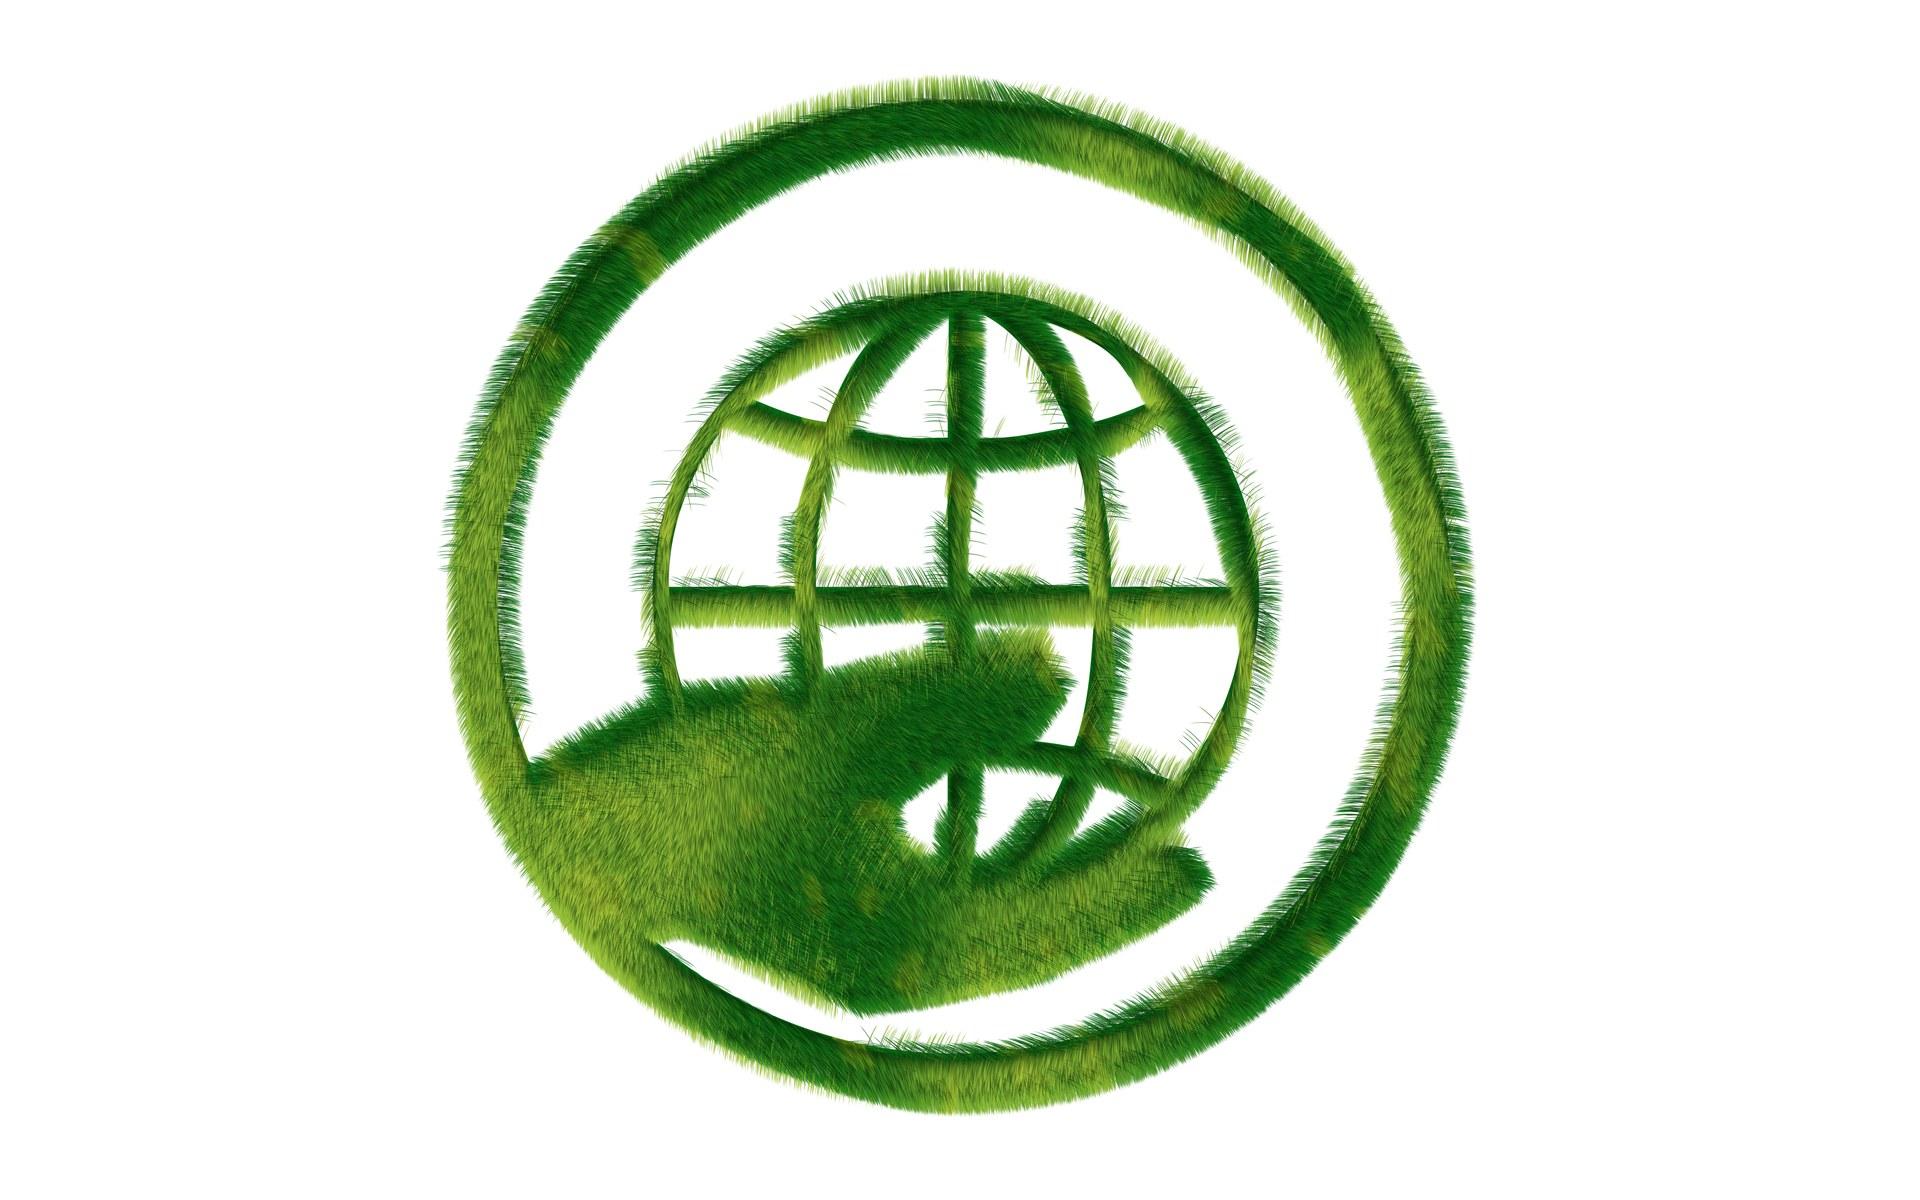 Green Peace | Mydreamwall's Blog Greenpeace